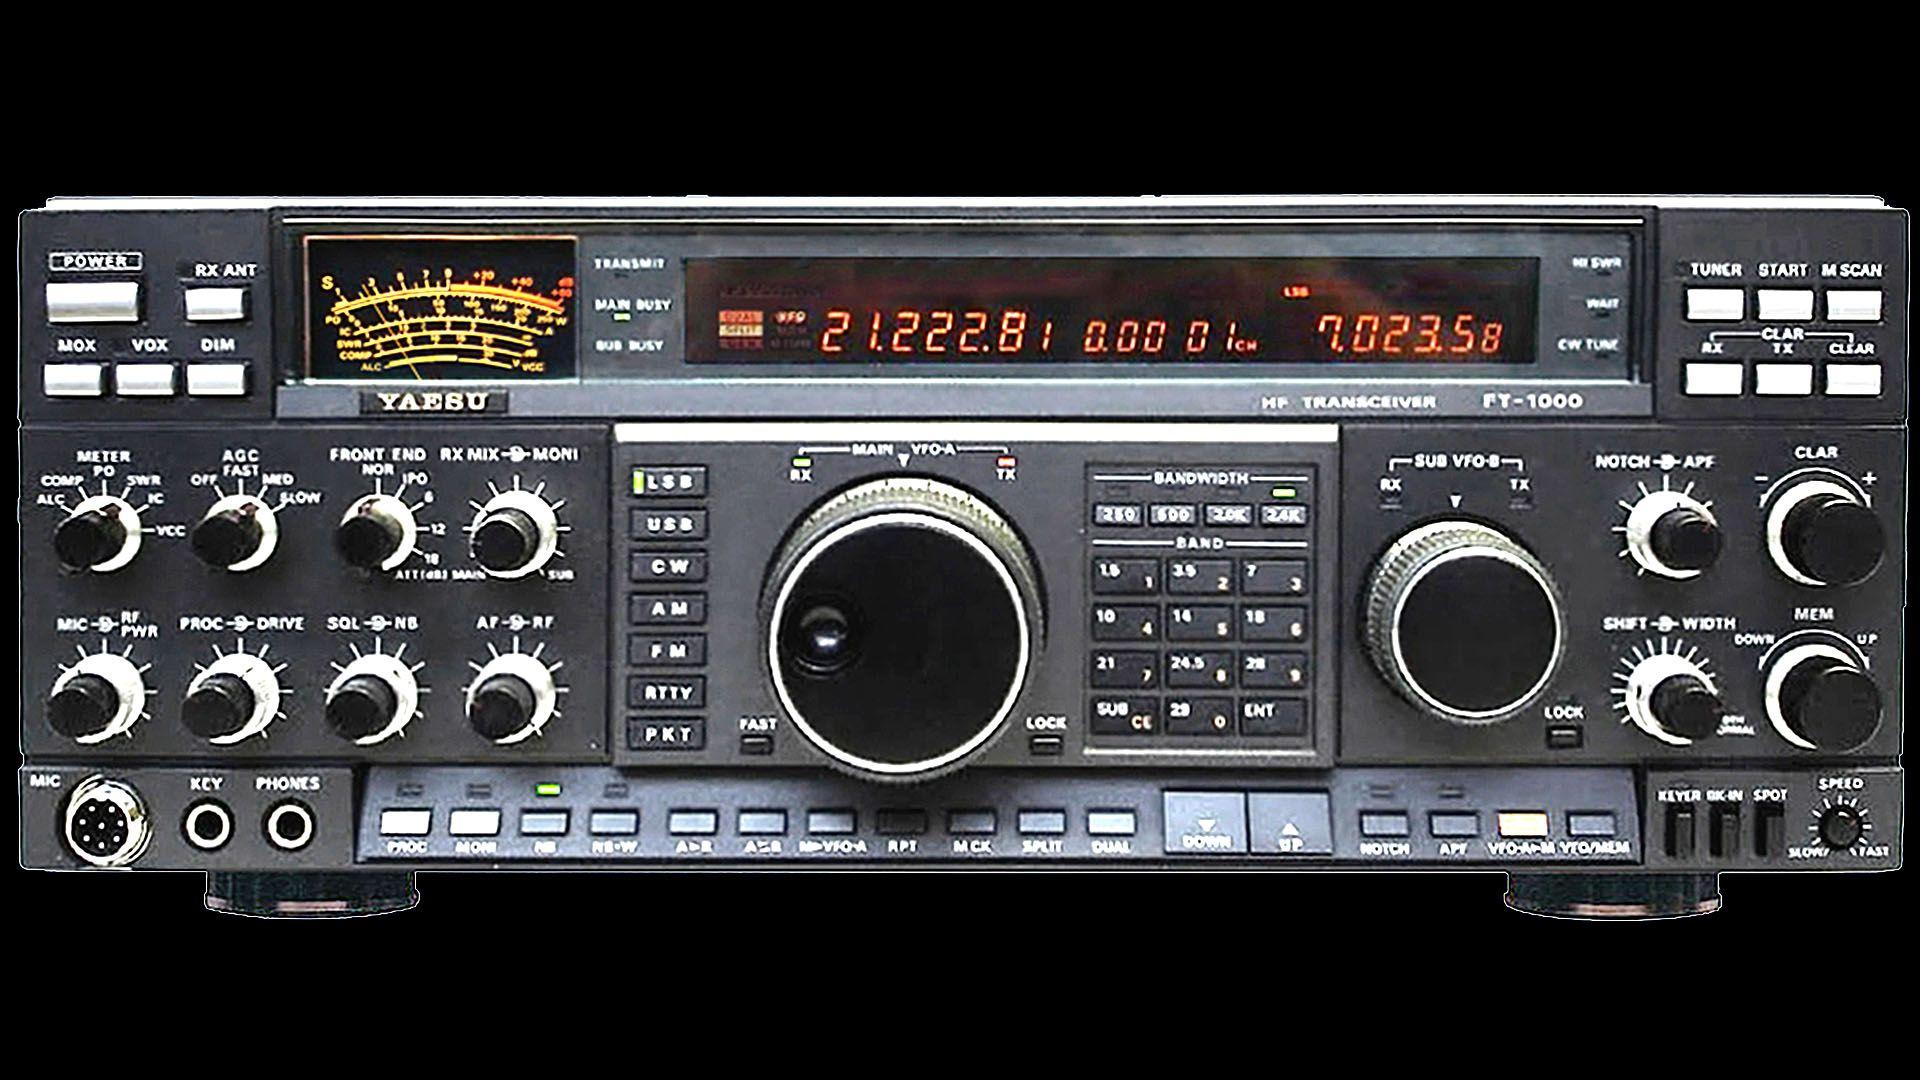 Pin On Radios Tvs